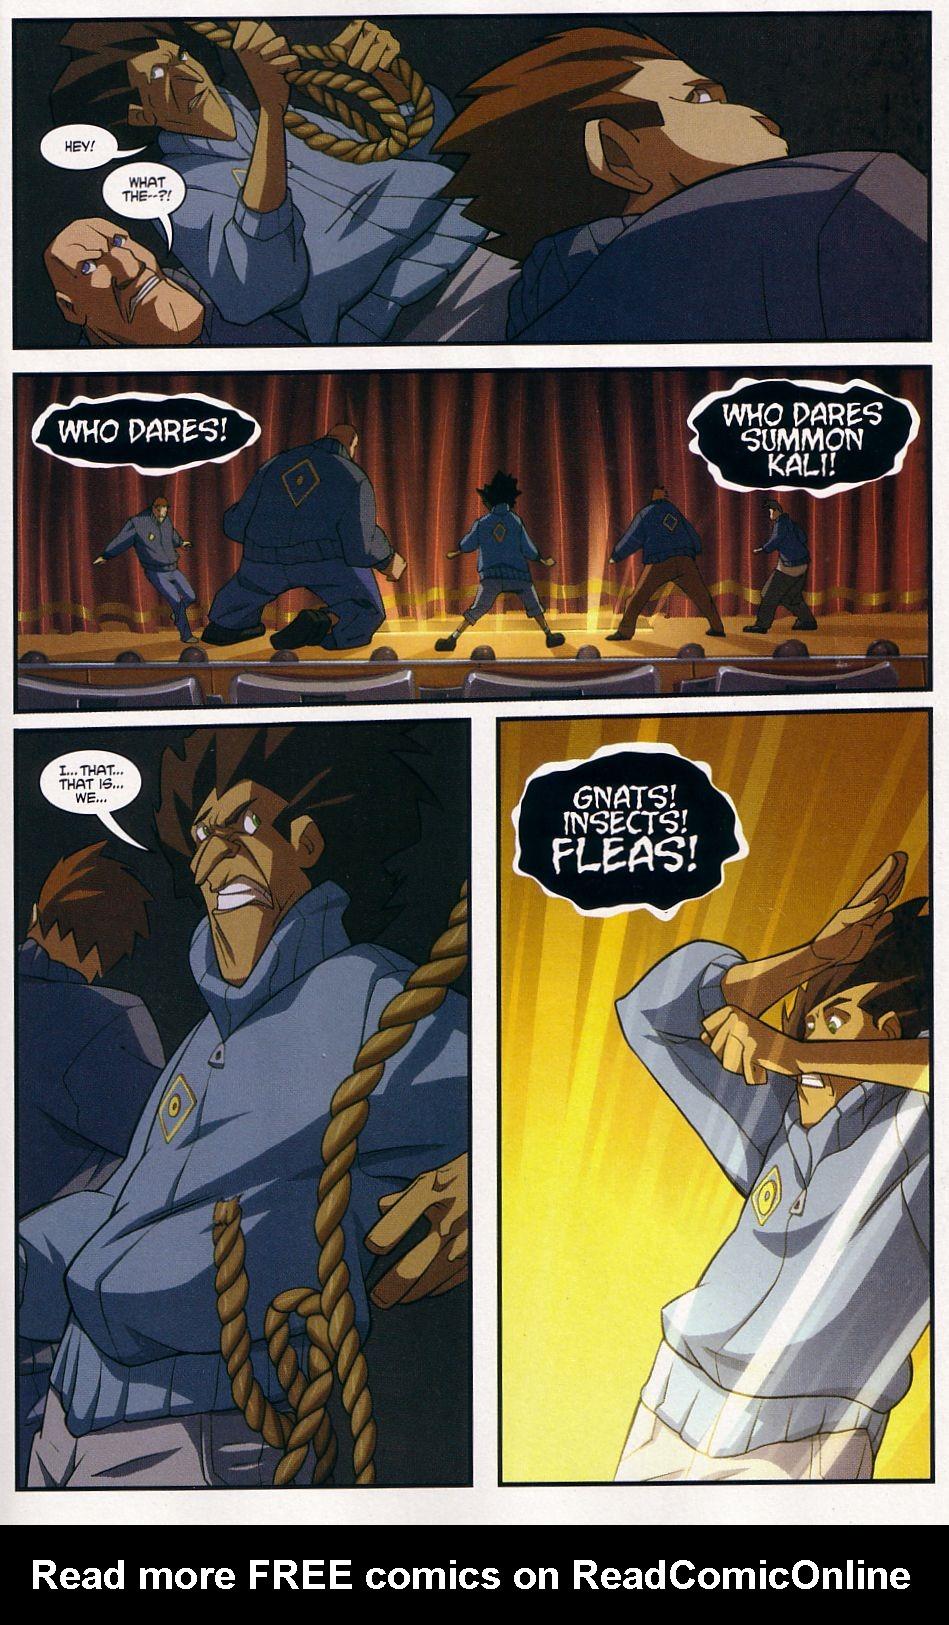 Teenage Mutant Ninja Turtles (2003) chap 7 pic 19